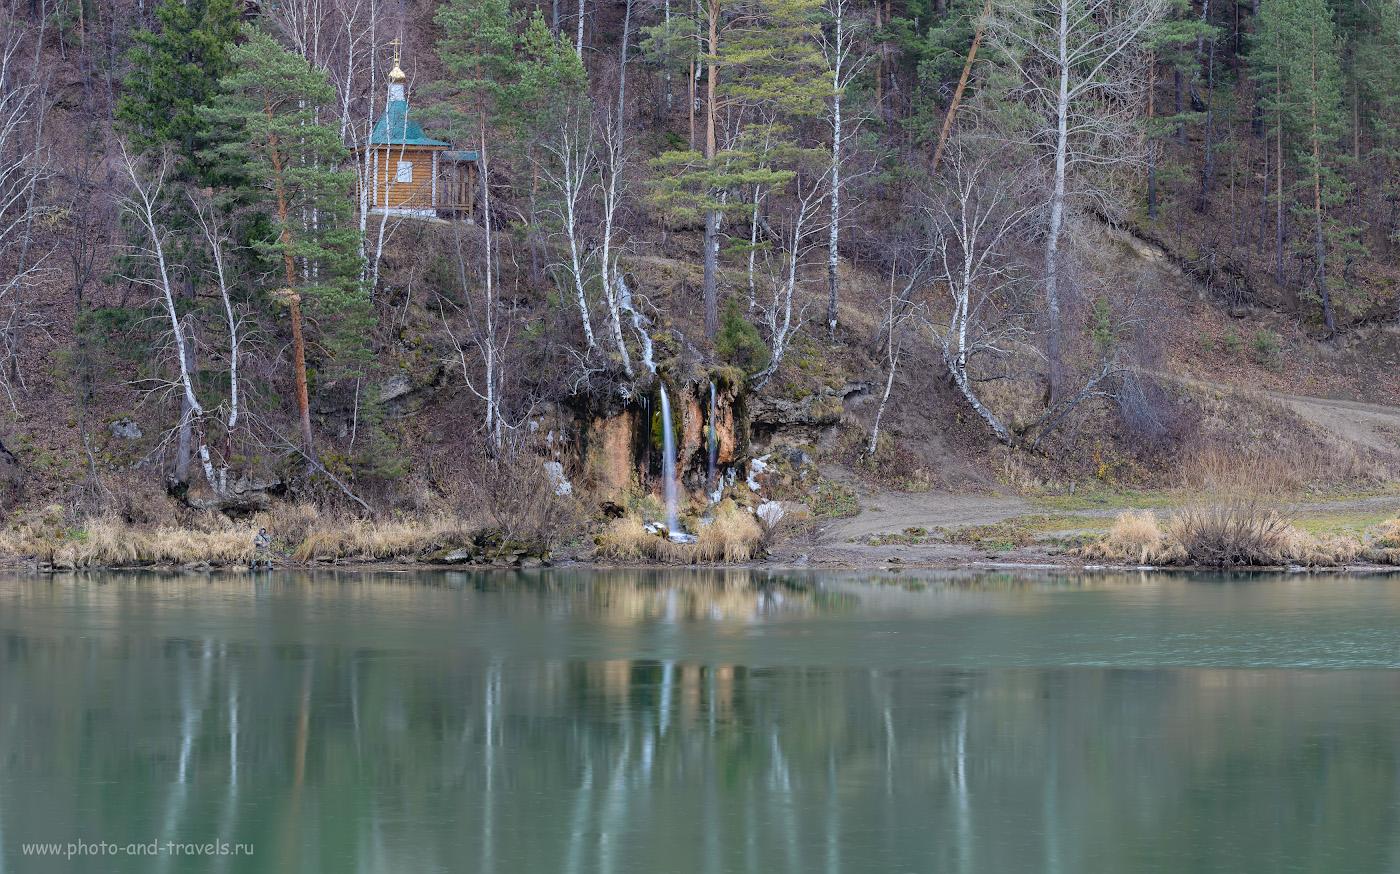 Фотография 4. Так выглядит водопад Плакун в начале ноября. Снято на Nikon D610 + Nikon 70-200mm f/2.8G со штатива Sirui T-2204X. Настройки: 1.6 сек., 8.0, 100, 82.